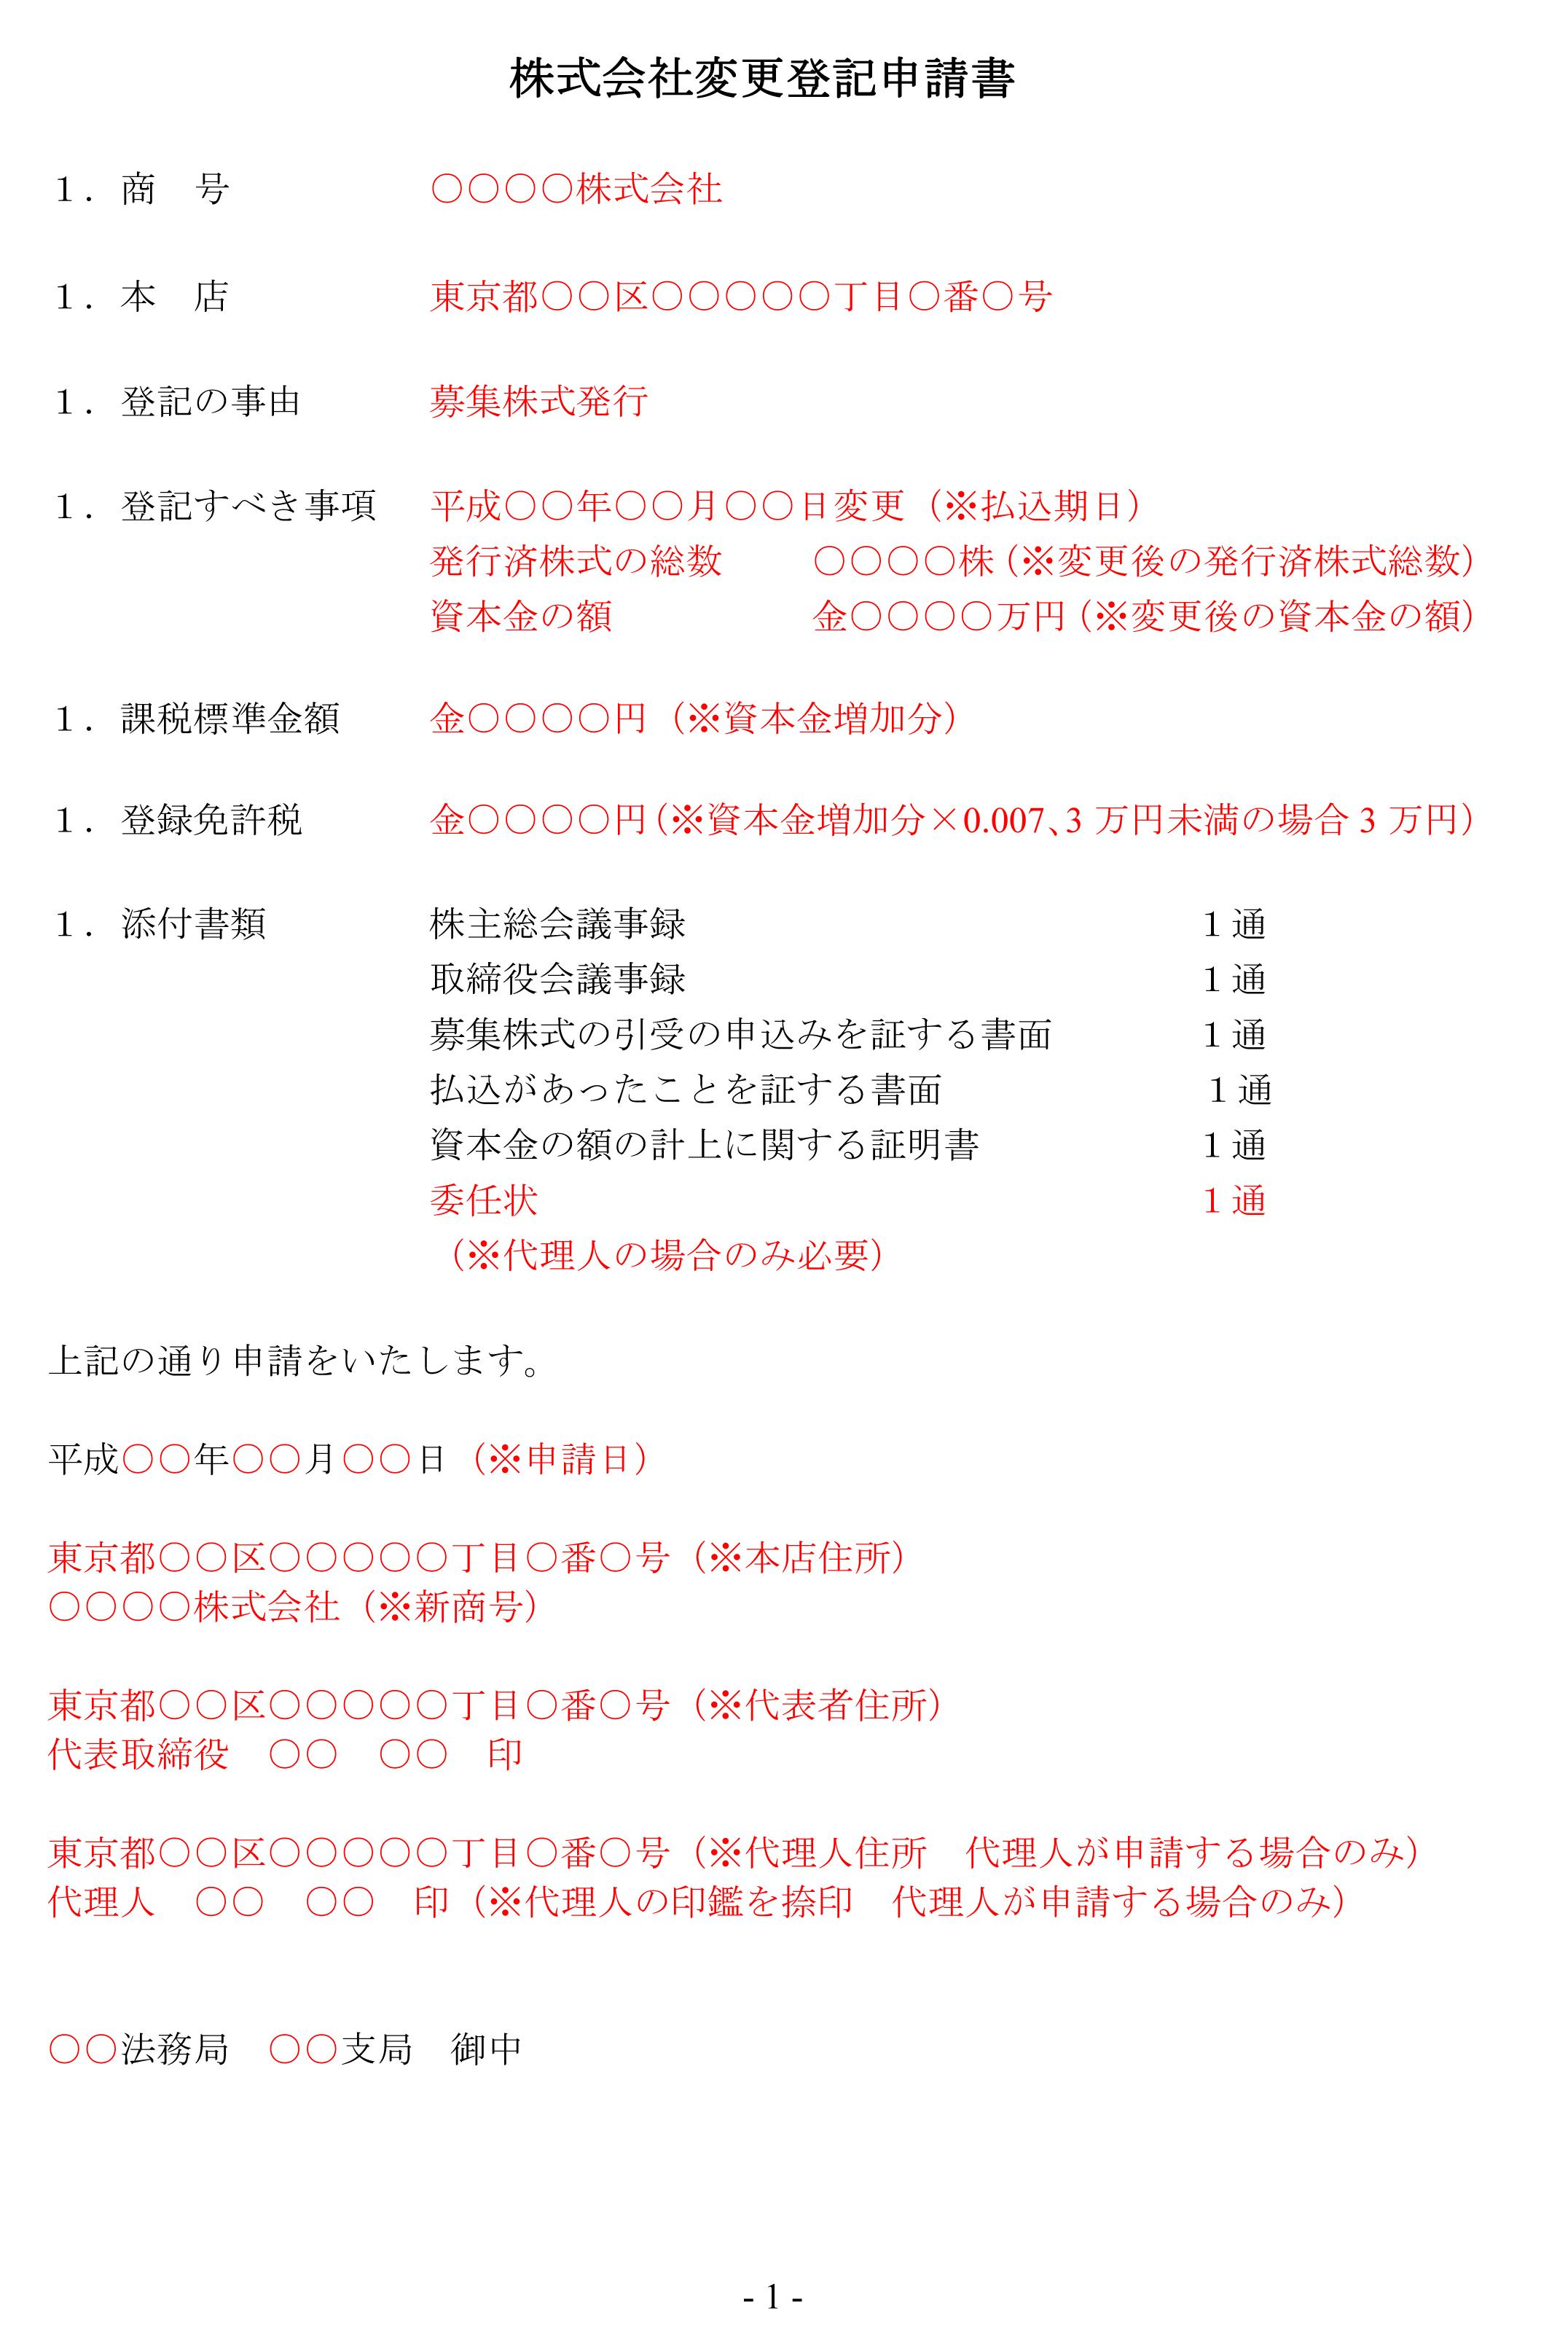 登記申請書(募集株式発行)の書...